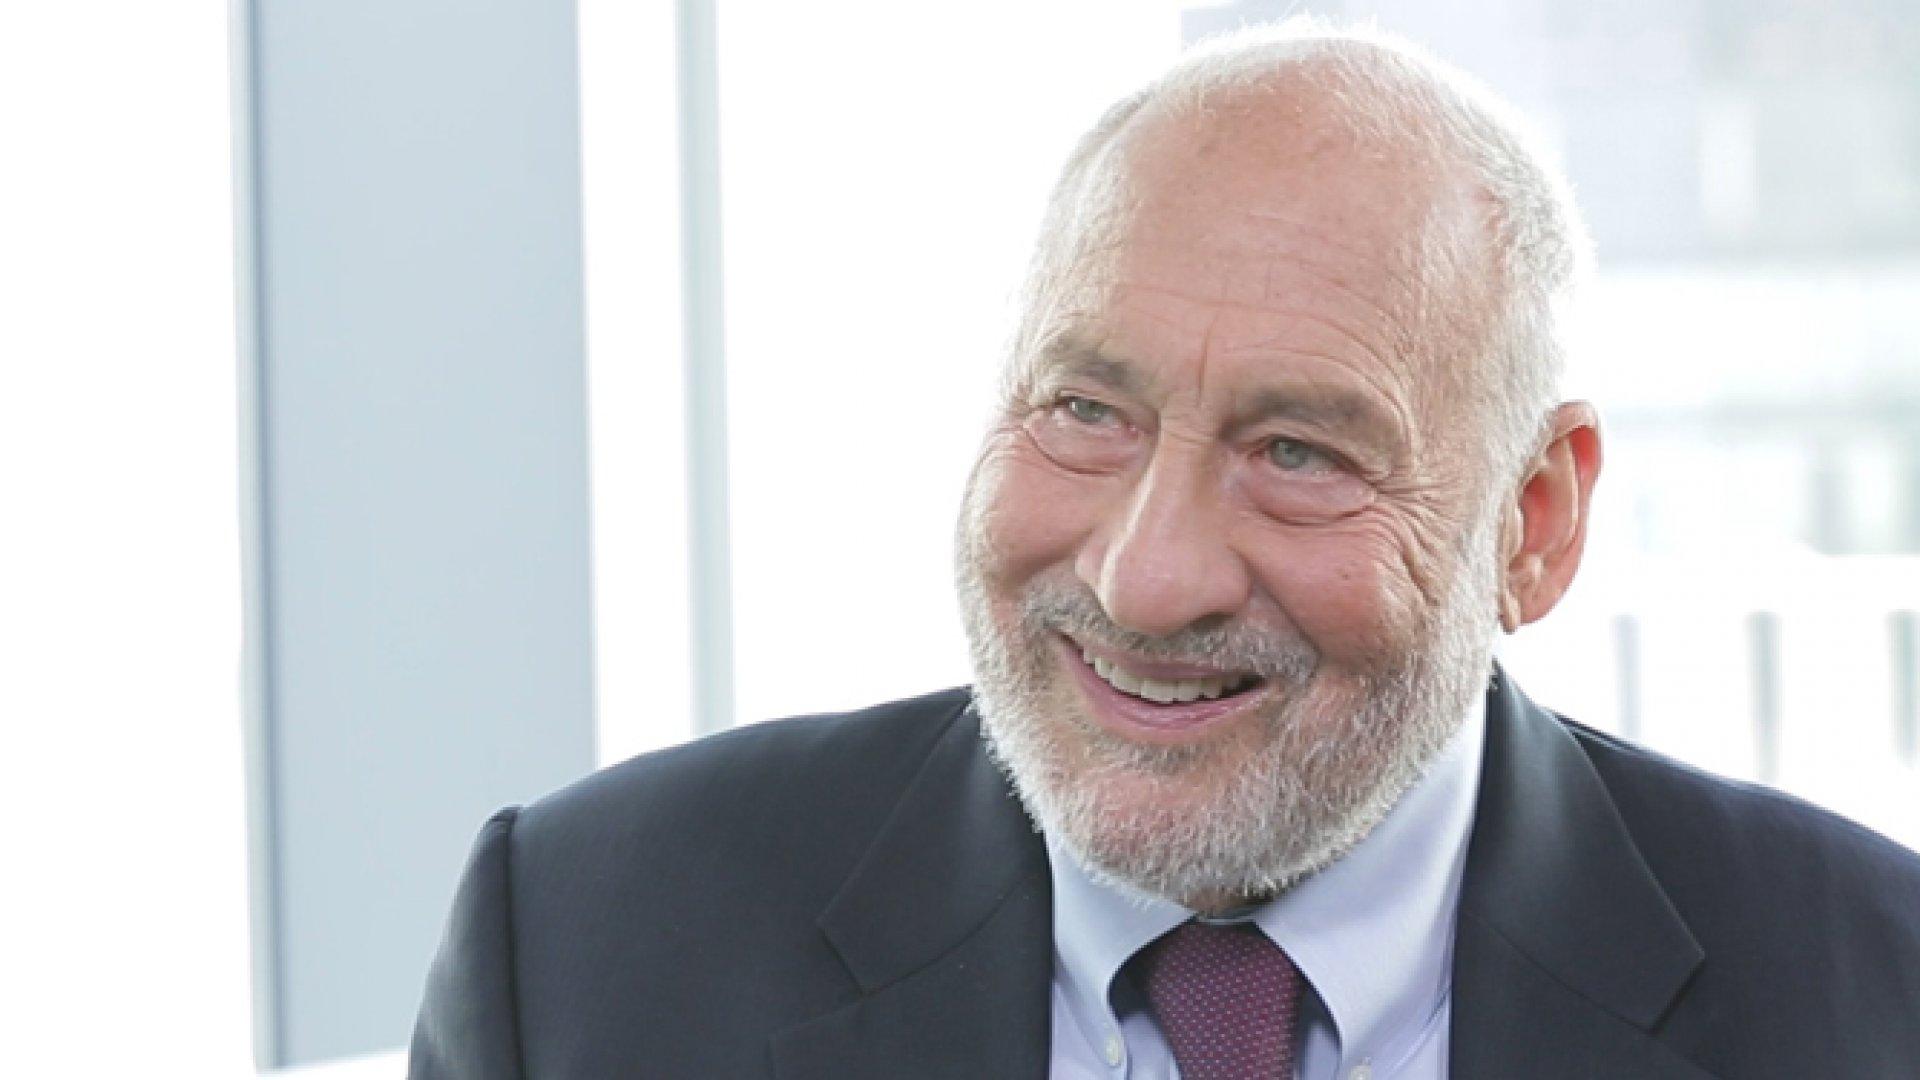 Joseph Stiglitz is a Nobel Prize-winning economist.